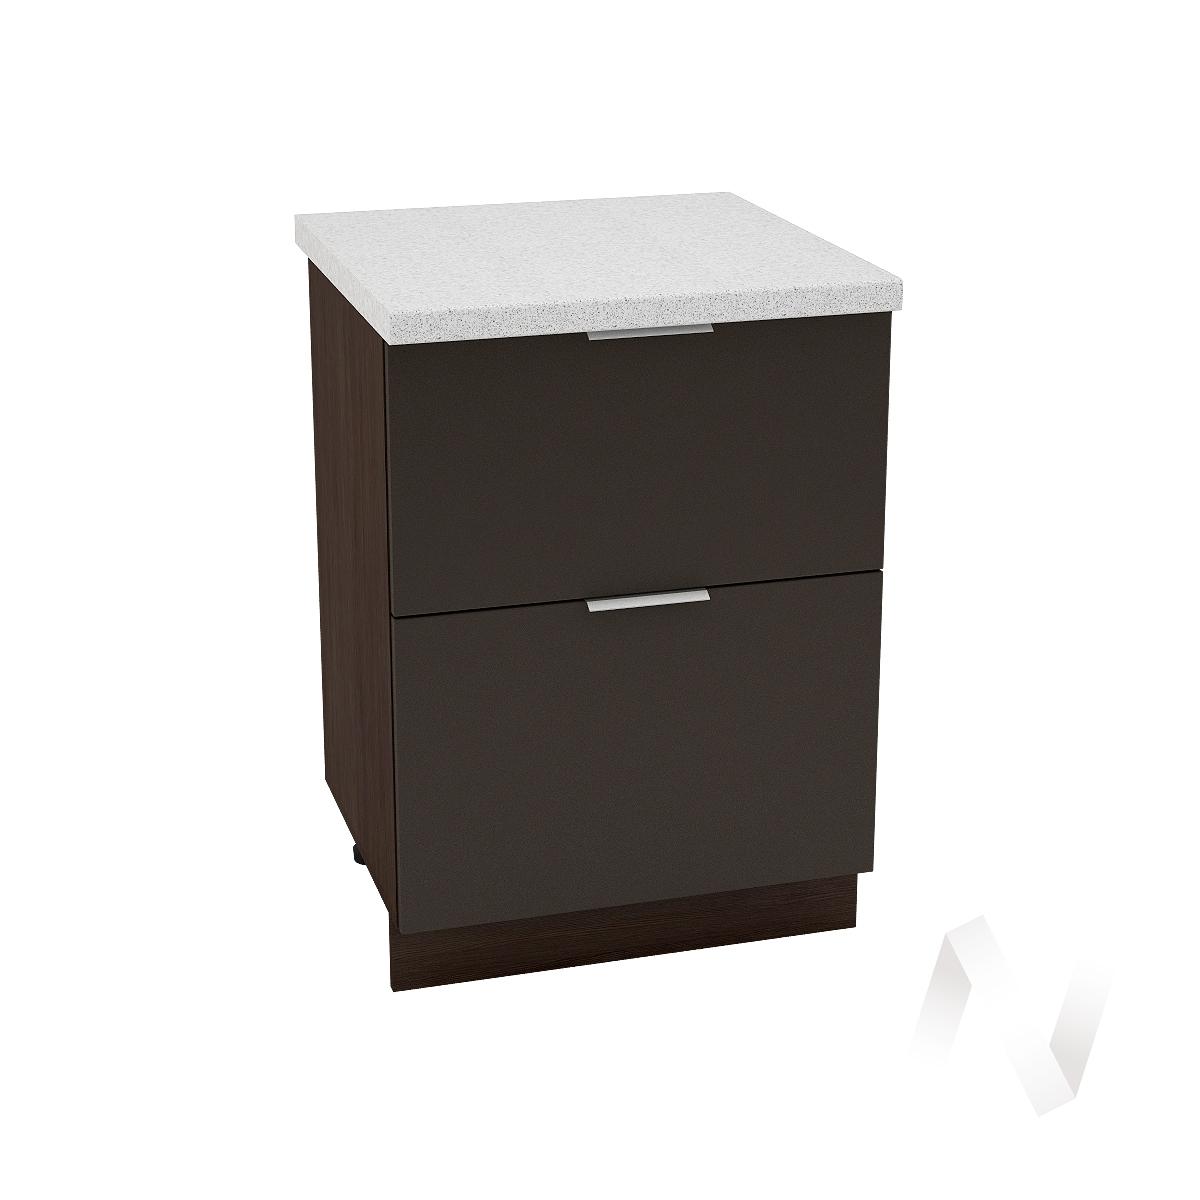 "Кухня ""Терра"": Шкаф нижний с 2-мя ящиками 600, ШН2Я 600 (смоки софт/корпус венге)"